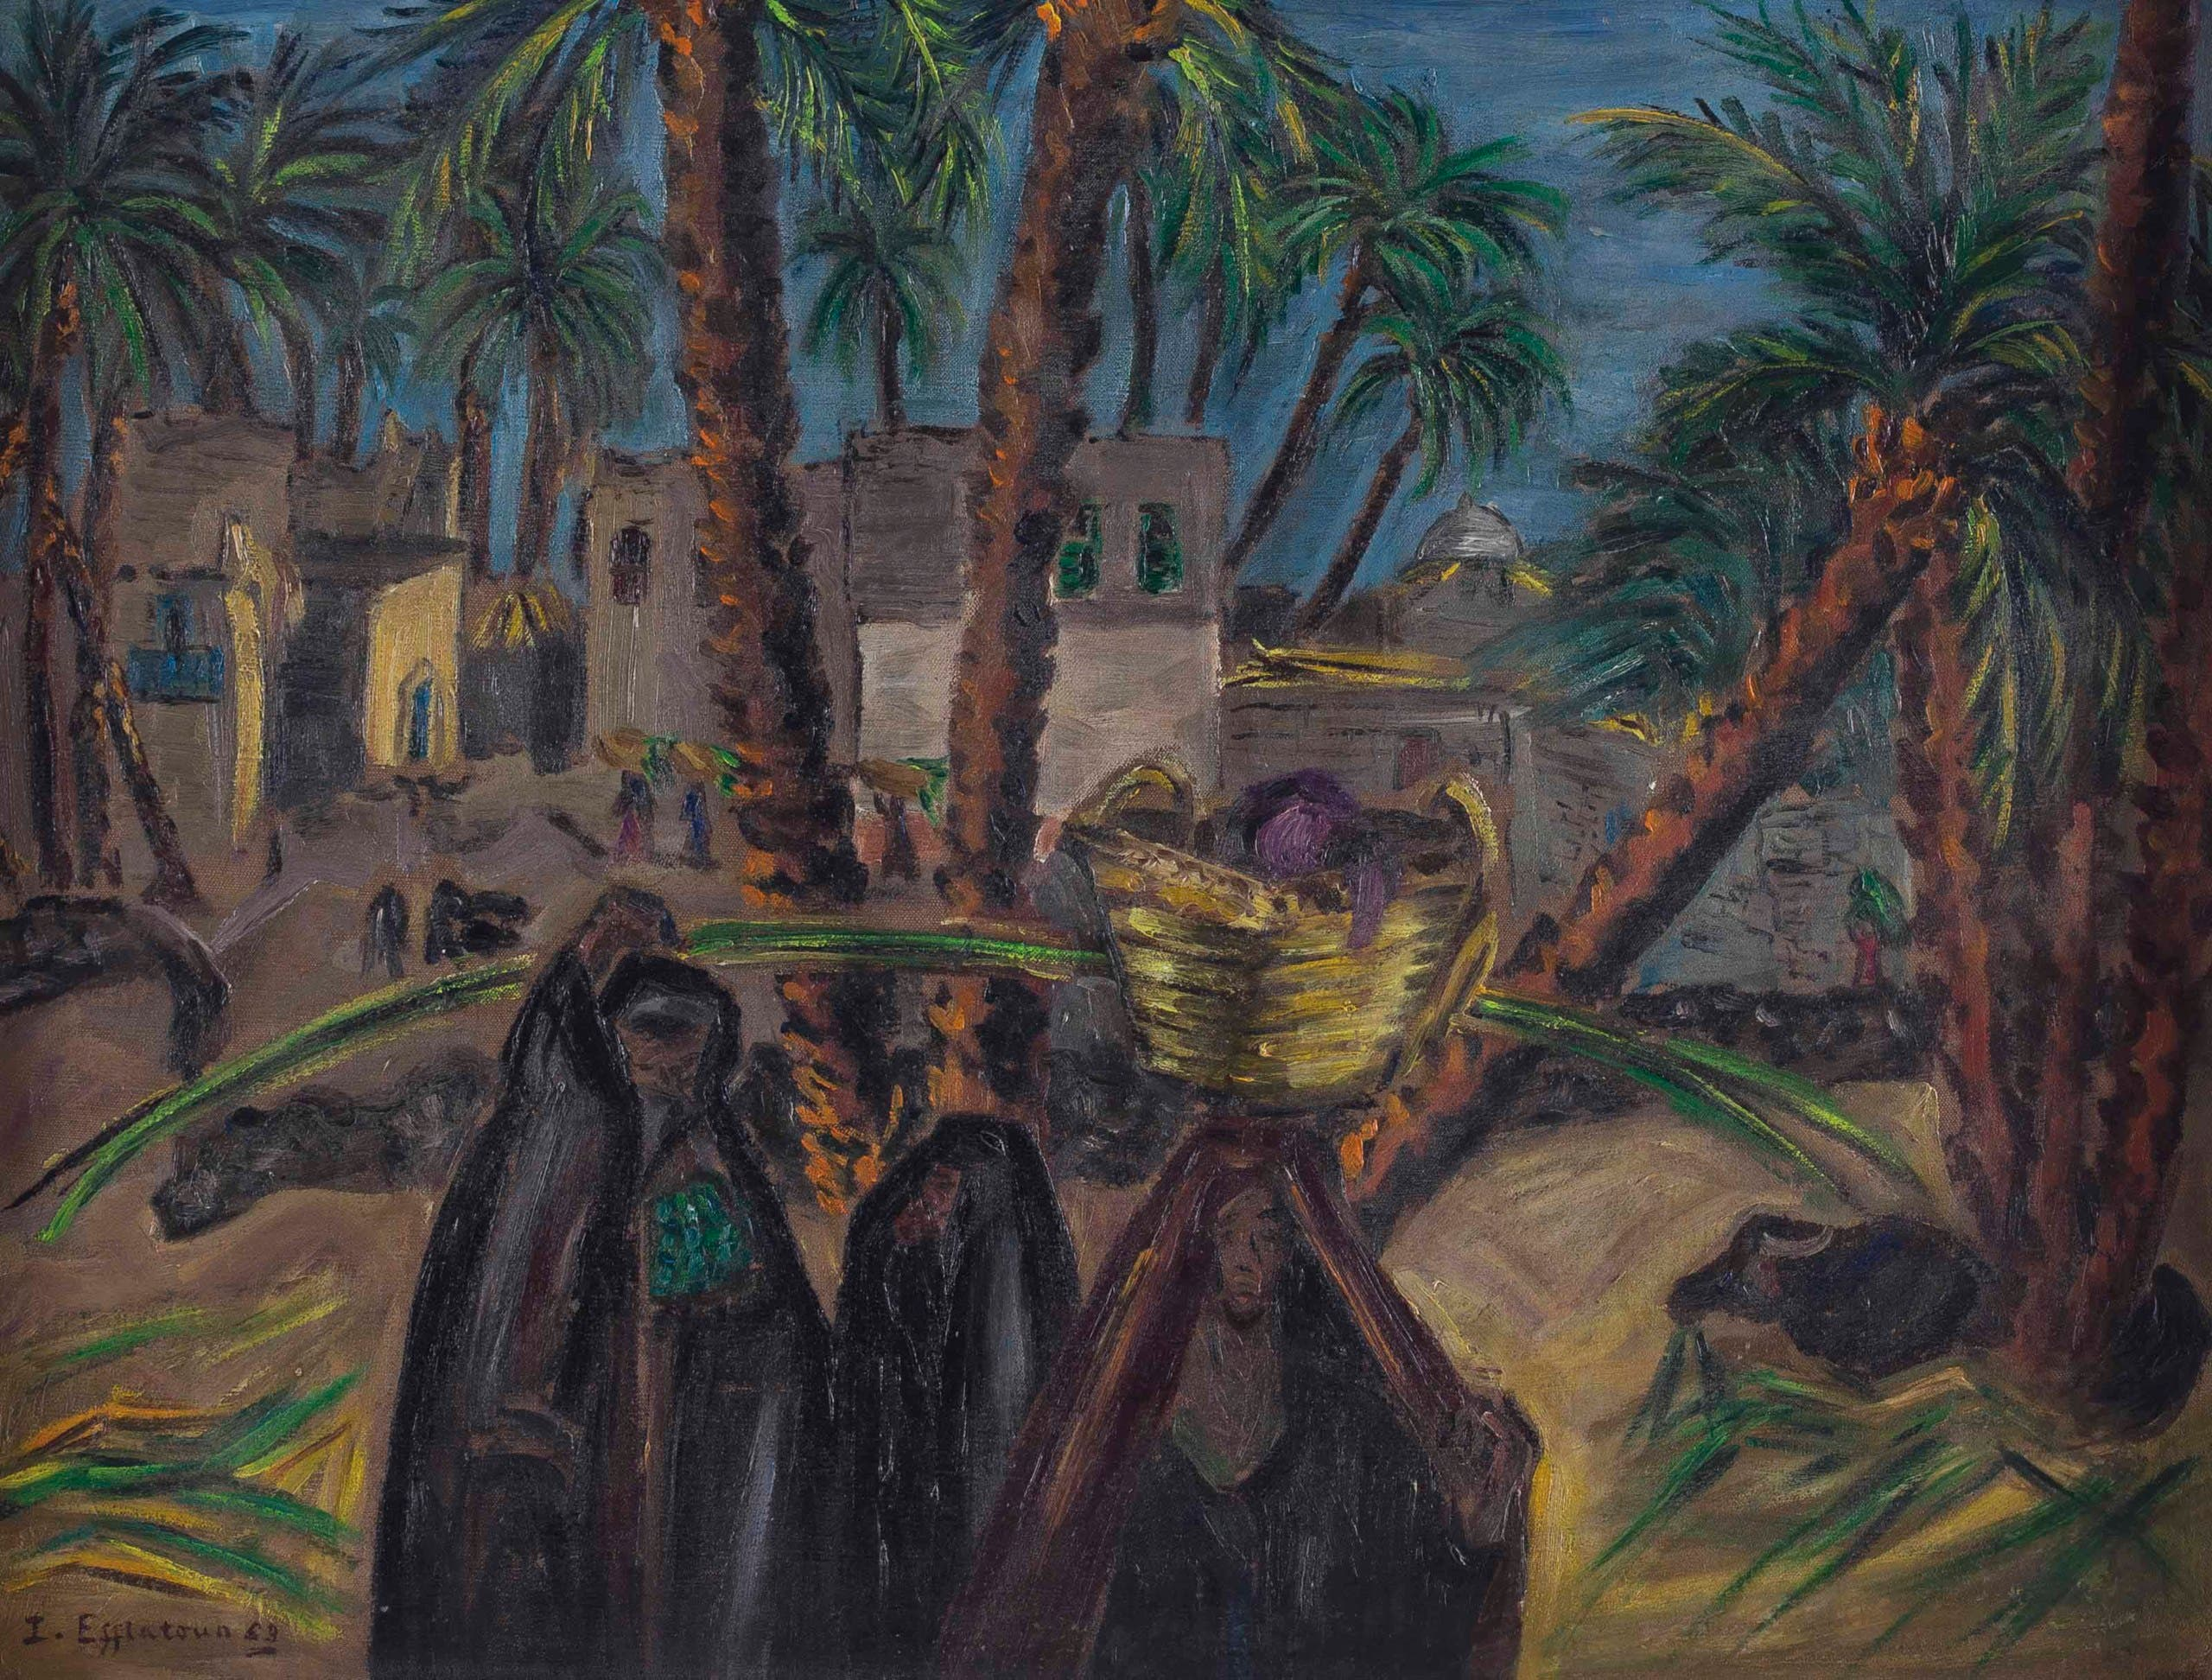 Inji Efflatoun, Ezba (Farm), 1953, Oil on board, 47 x 63 cm. (Image courtesy of Barjeel Art Foundation, Sharjah.)